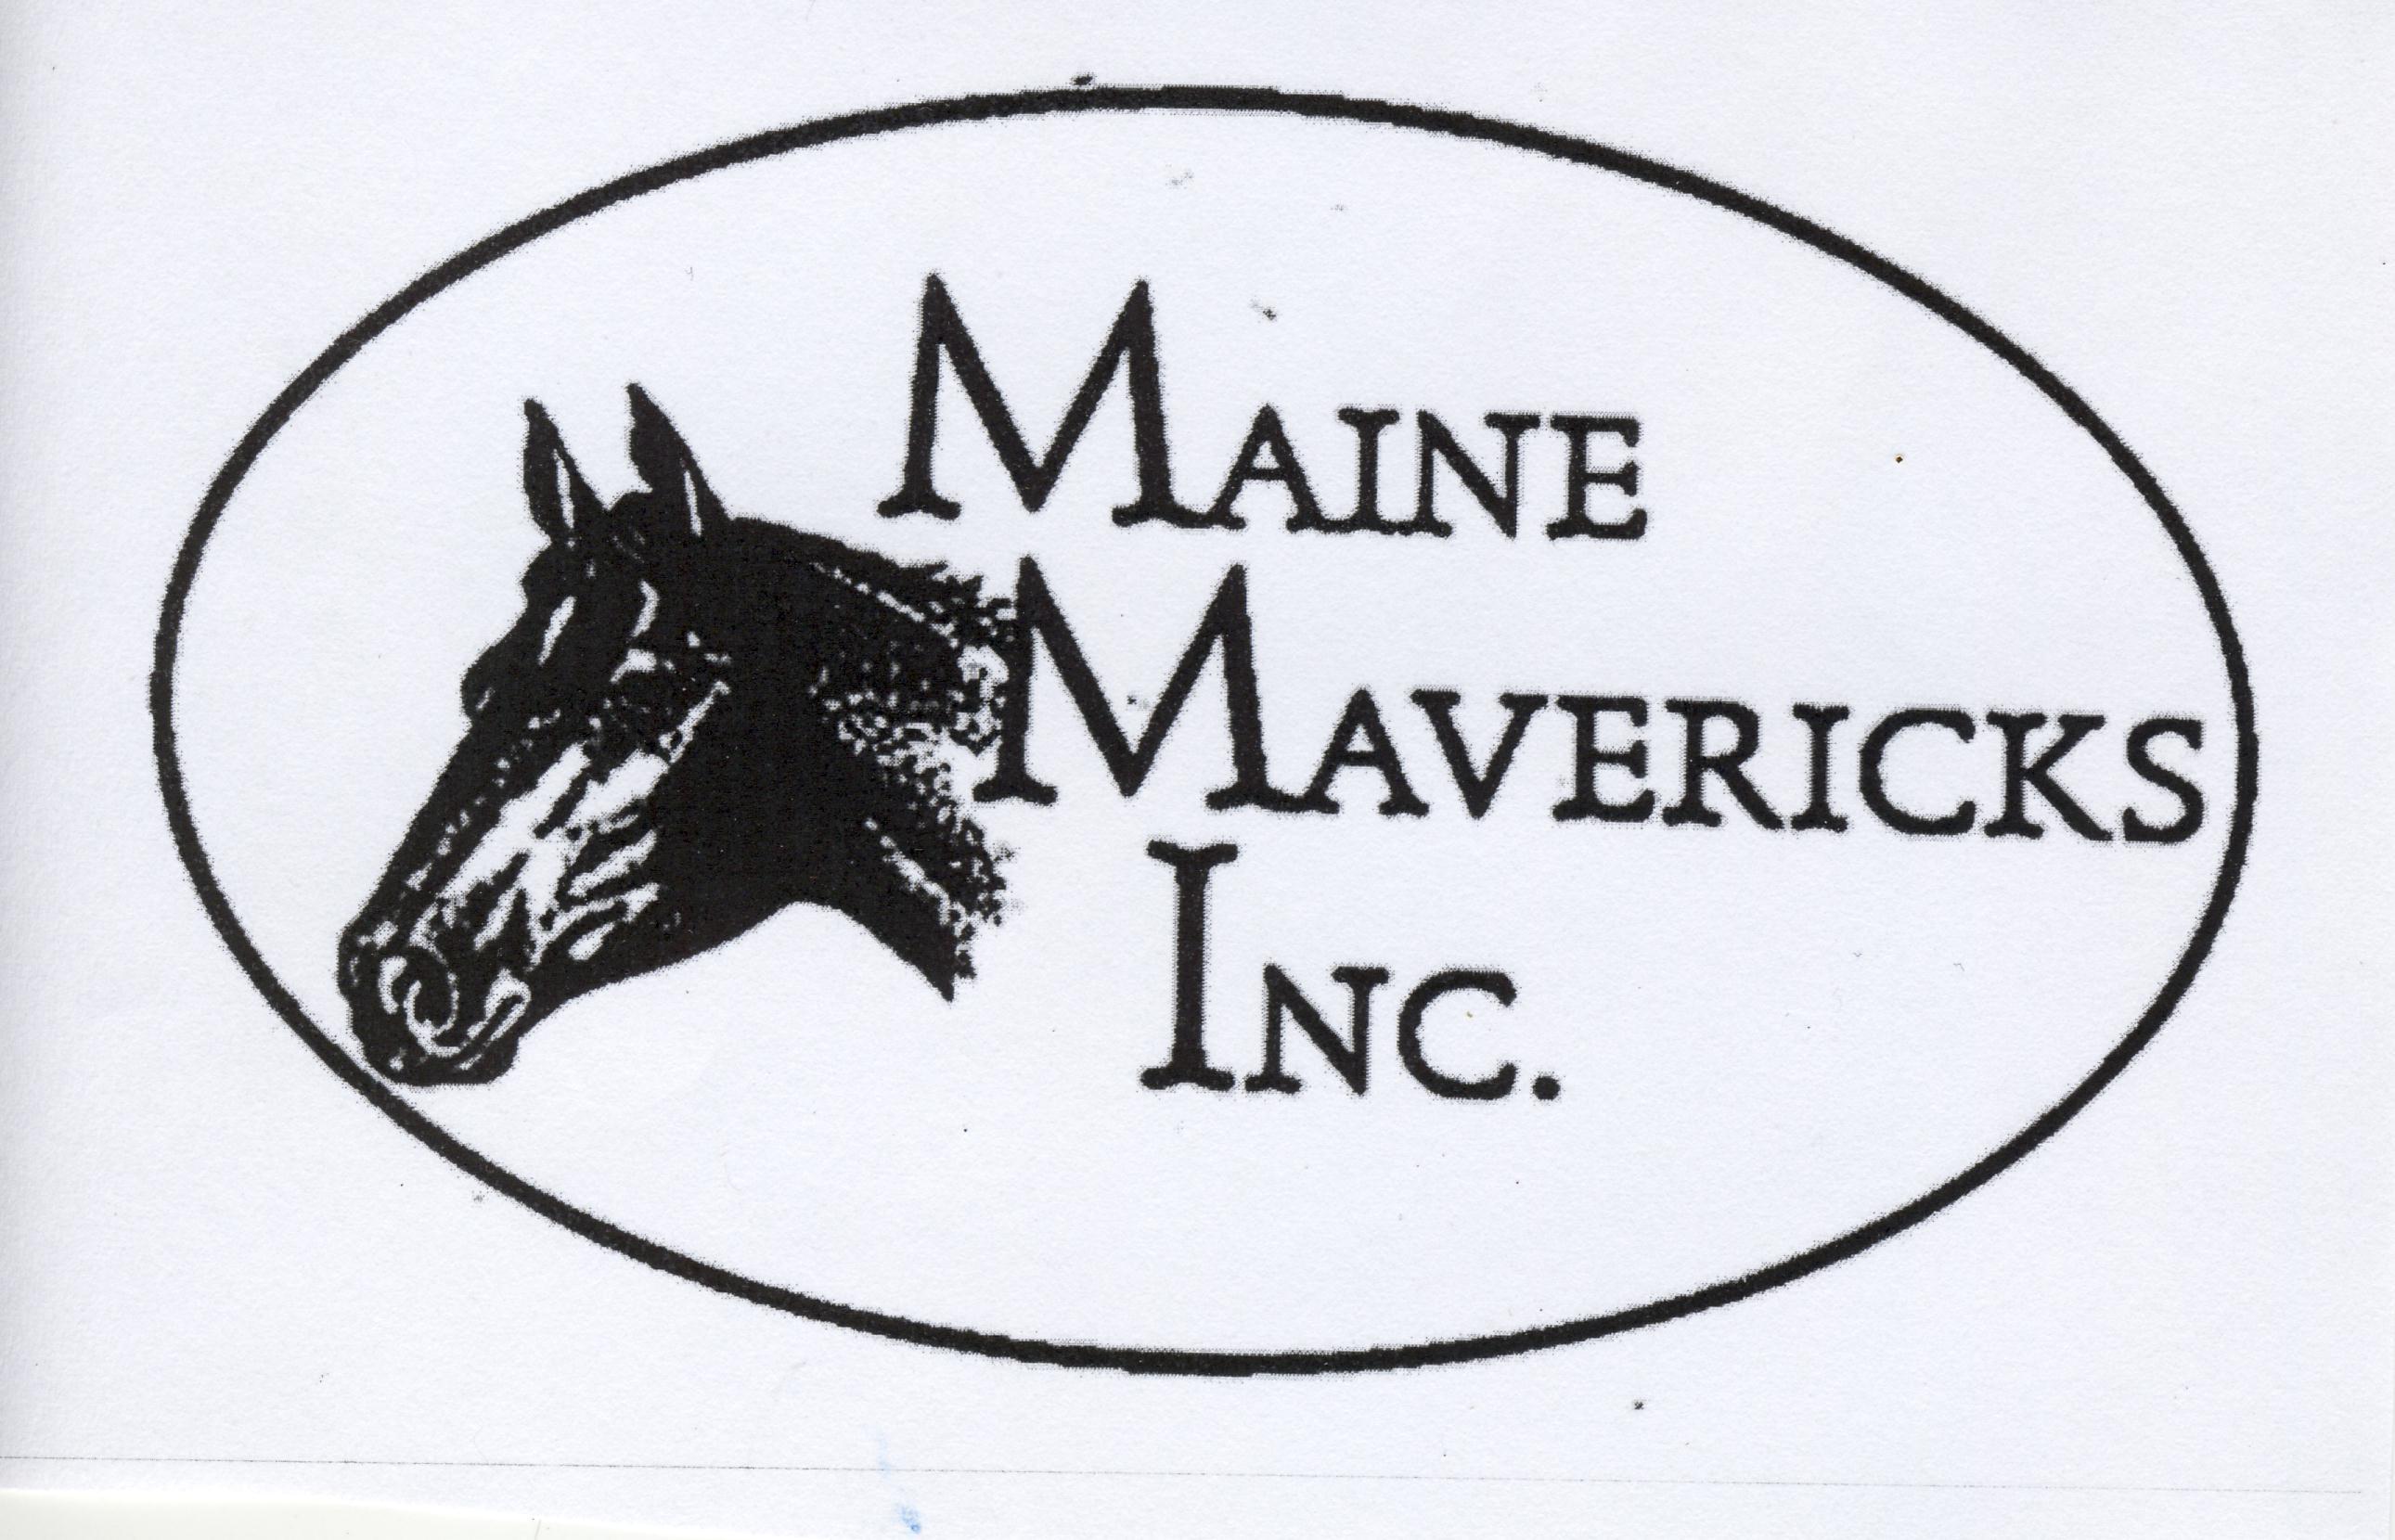 mainemavericks-old logo